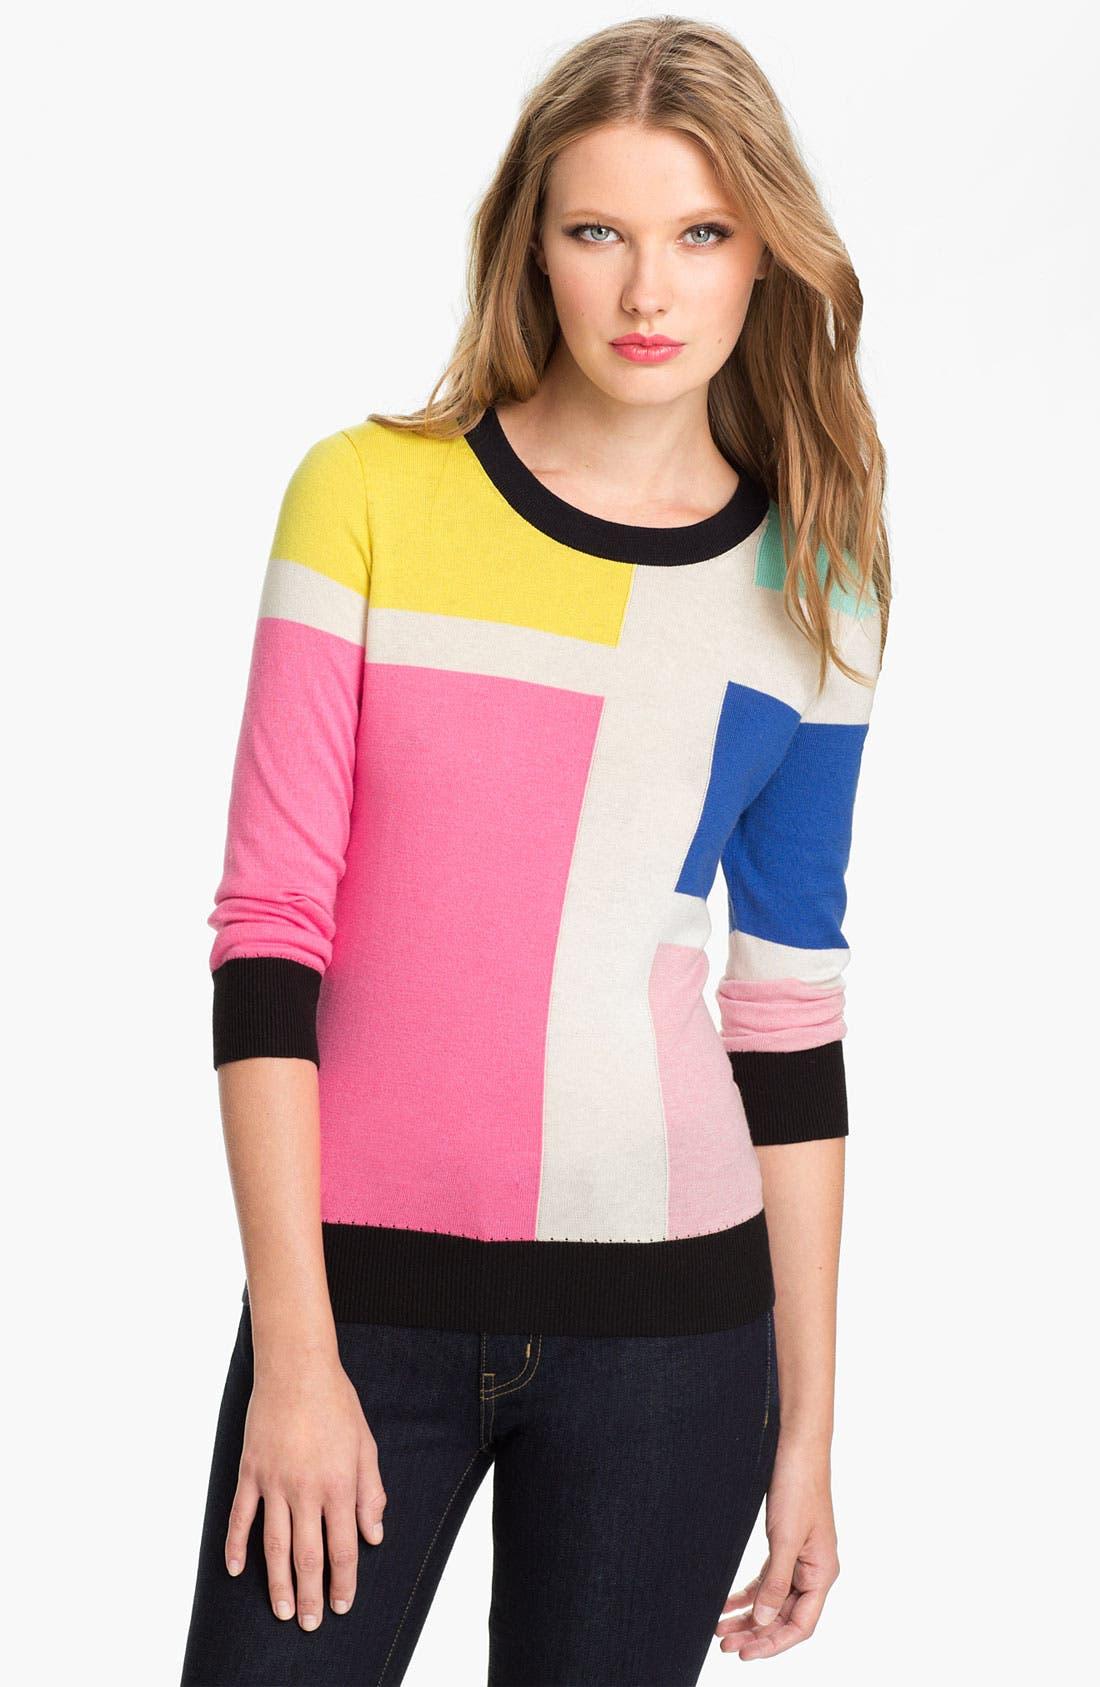 Alternate Image 1 Selected - kate spade new york 'meri' sweater